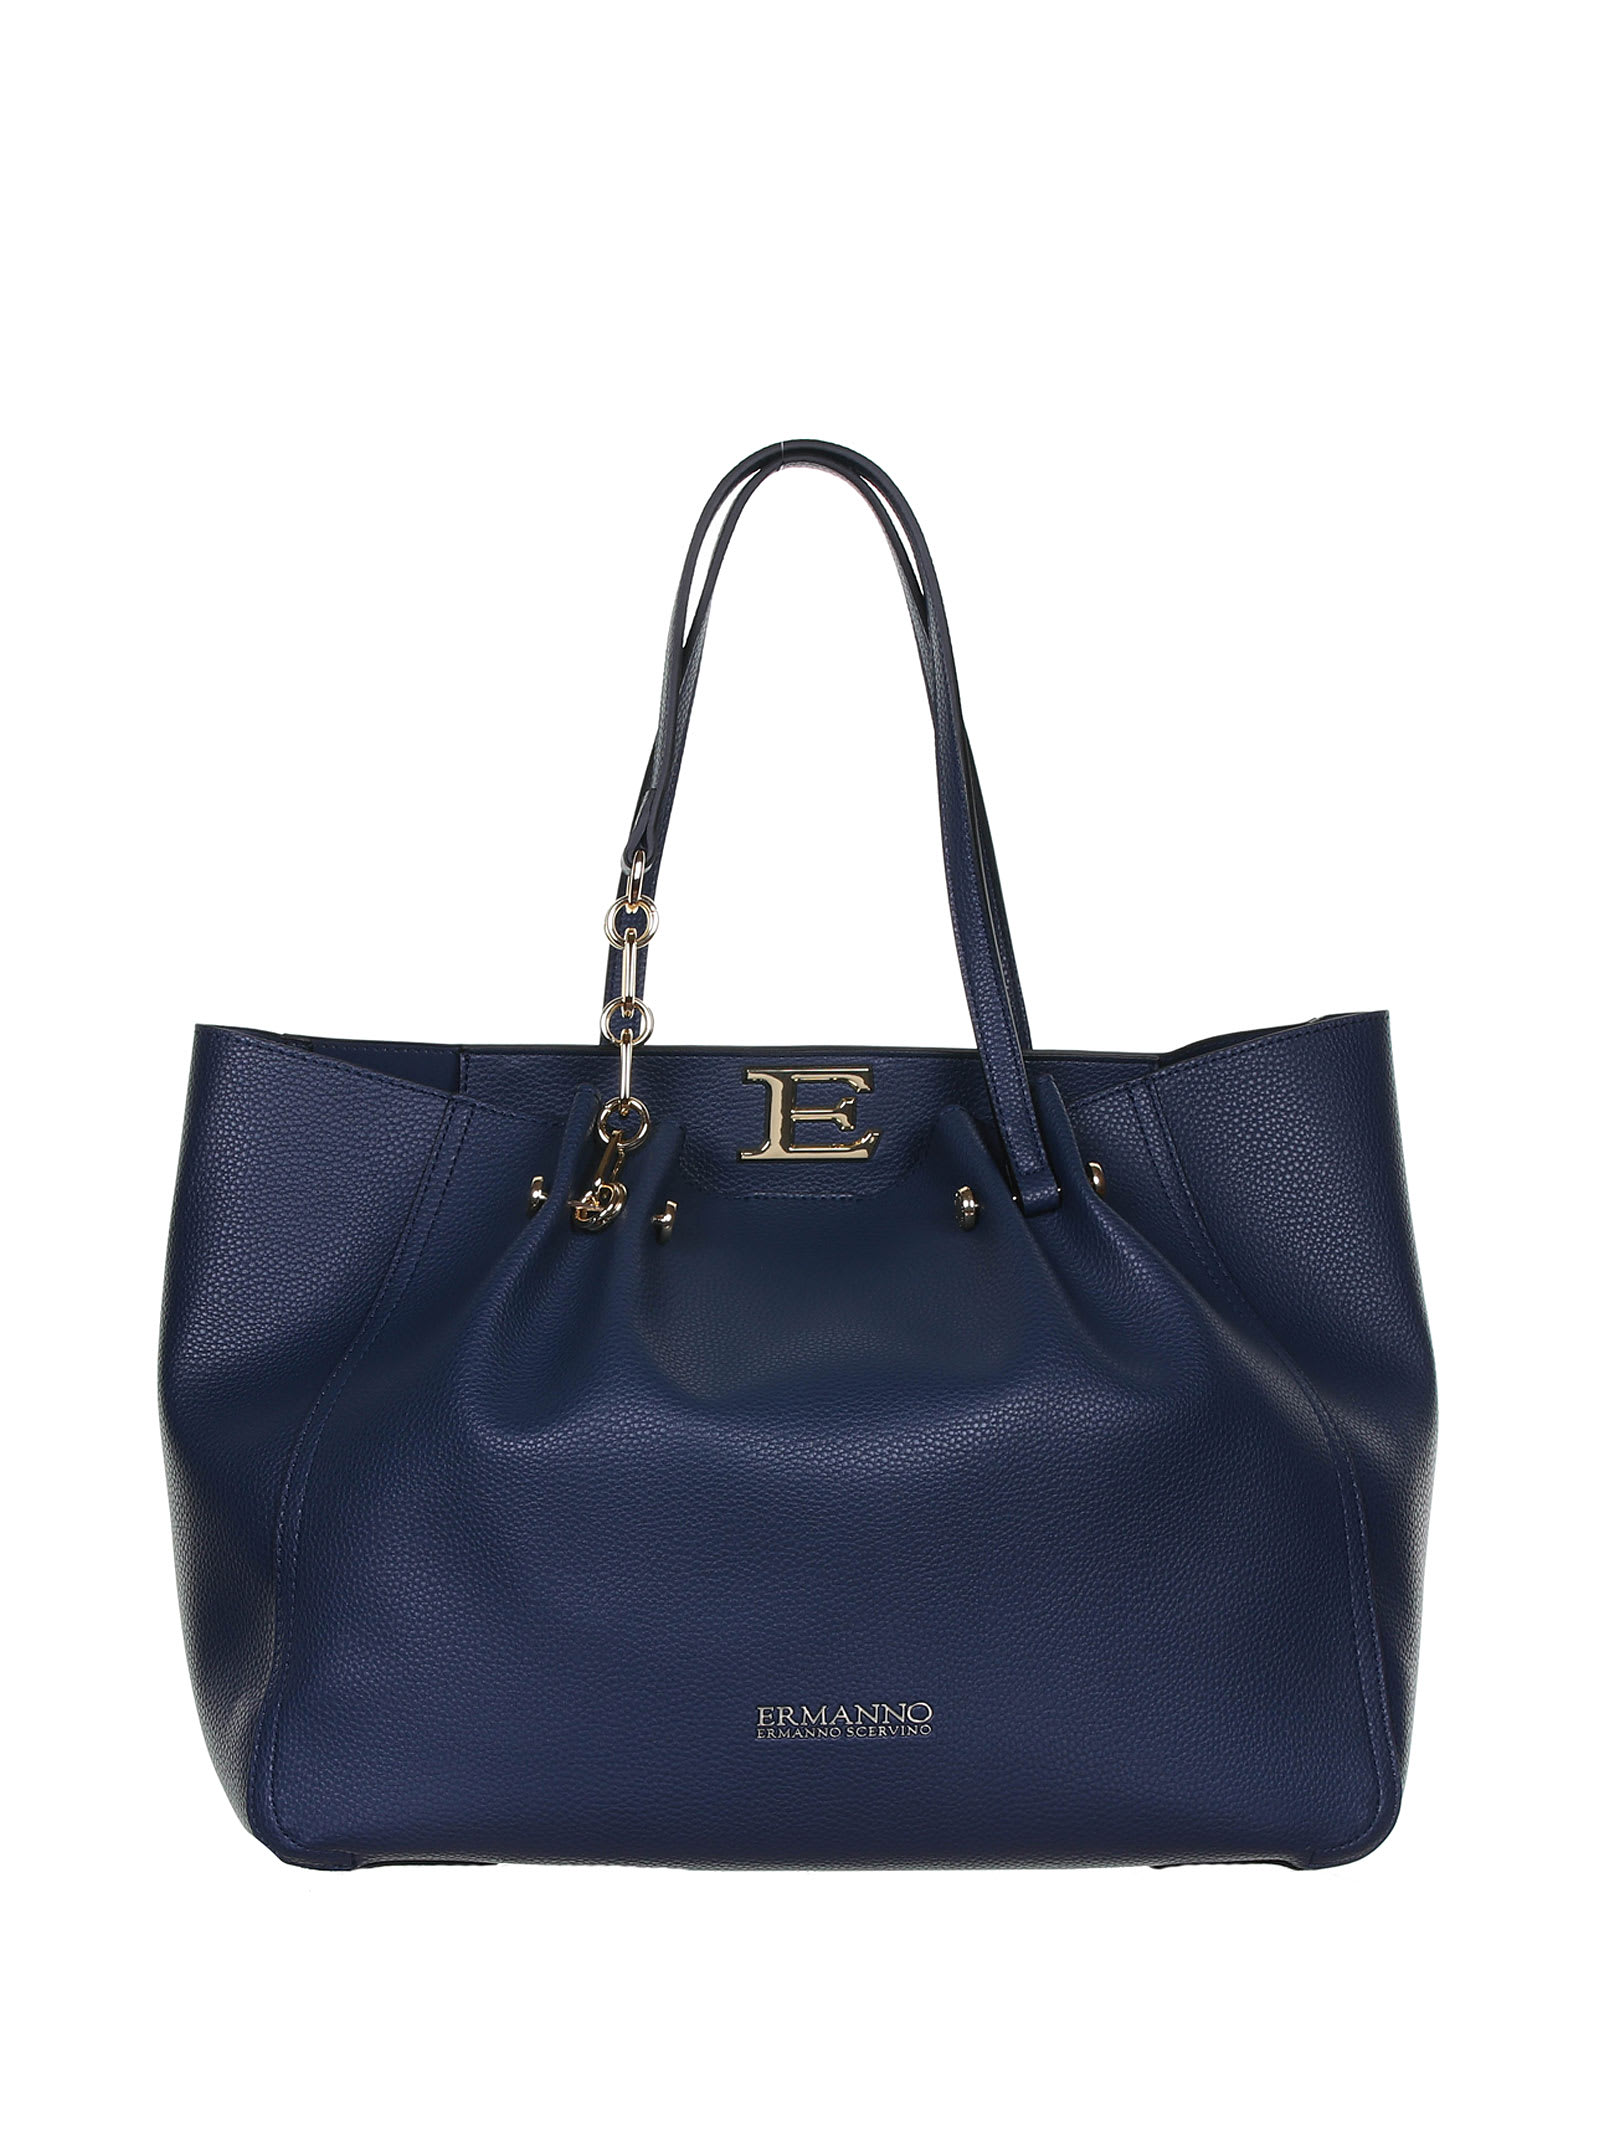 Ermanno Scervino Giovanna Blue Shopping Bag In Navy Blu